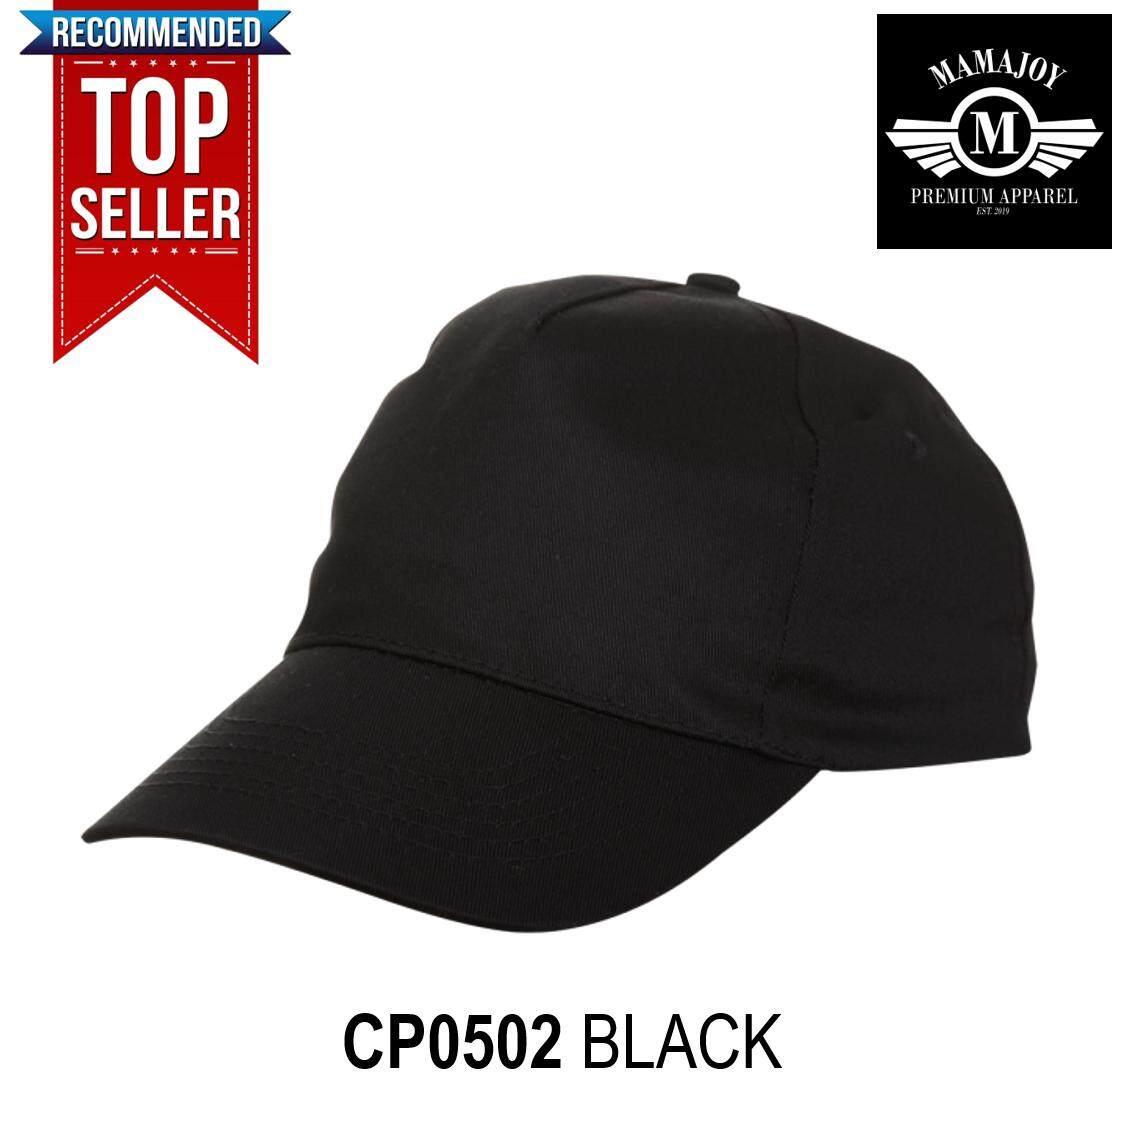 BEST OFFER! NEW! OREN SPORT CP05 Unisex Baseball Outdoor Velcro Adjustable  Hip-Hop 5-Panel Unisex Polyester Cap (BLACK) CP0502